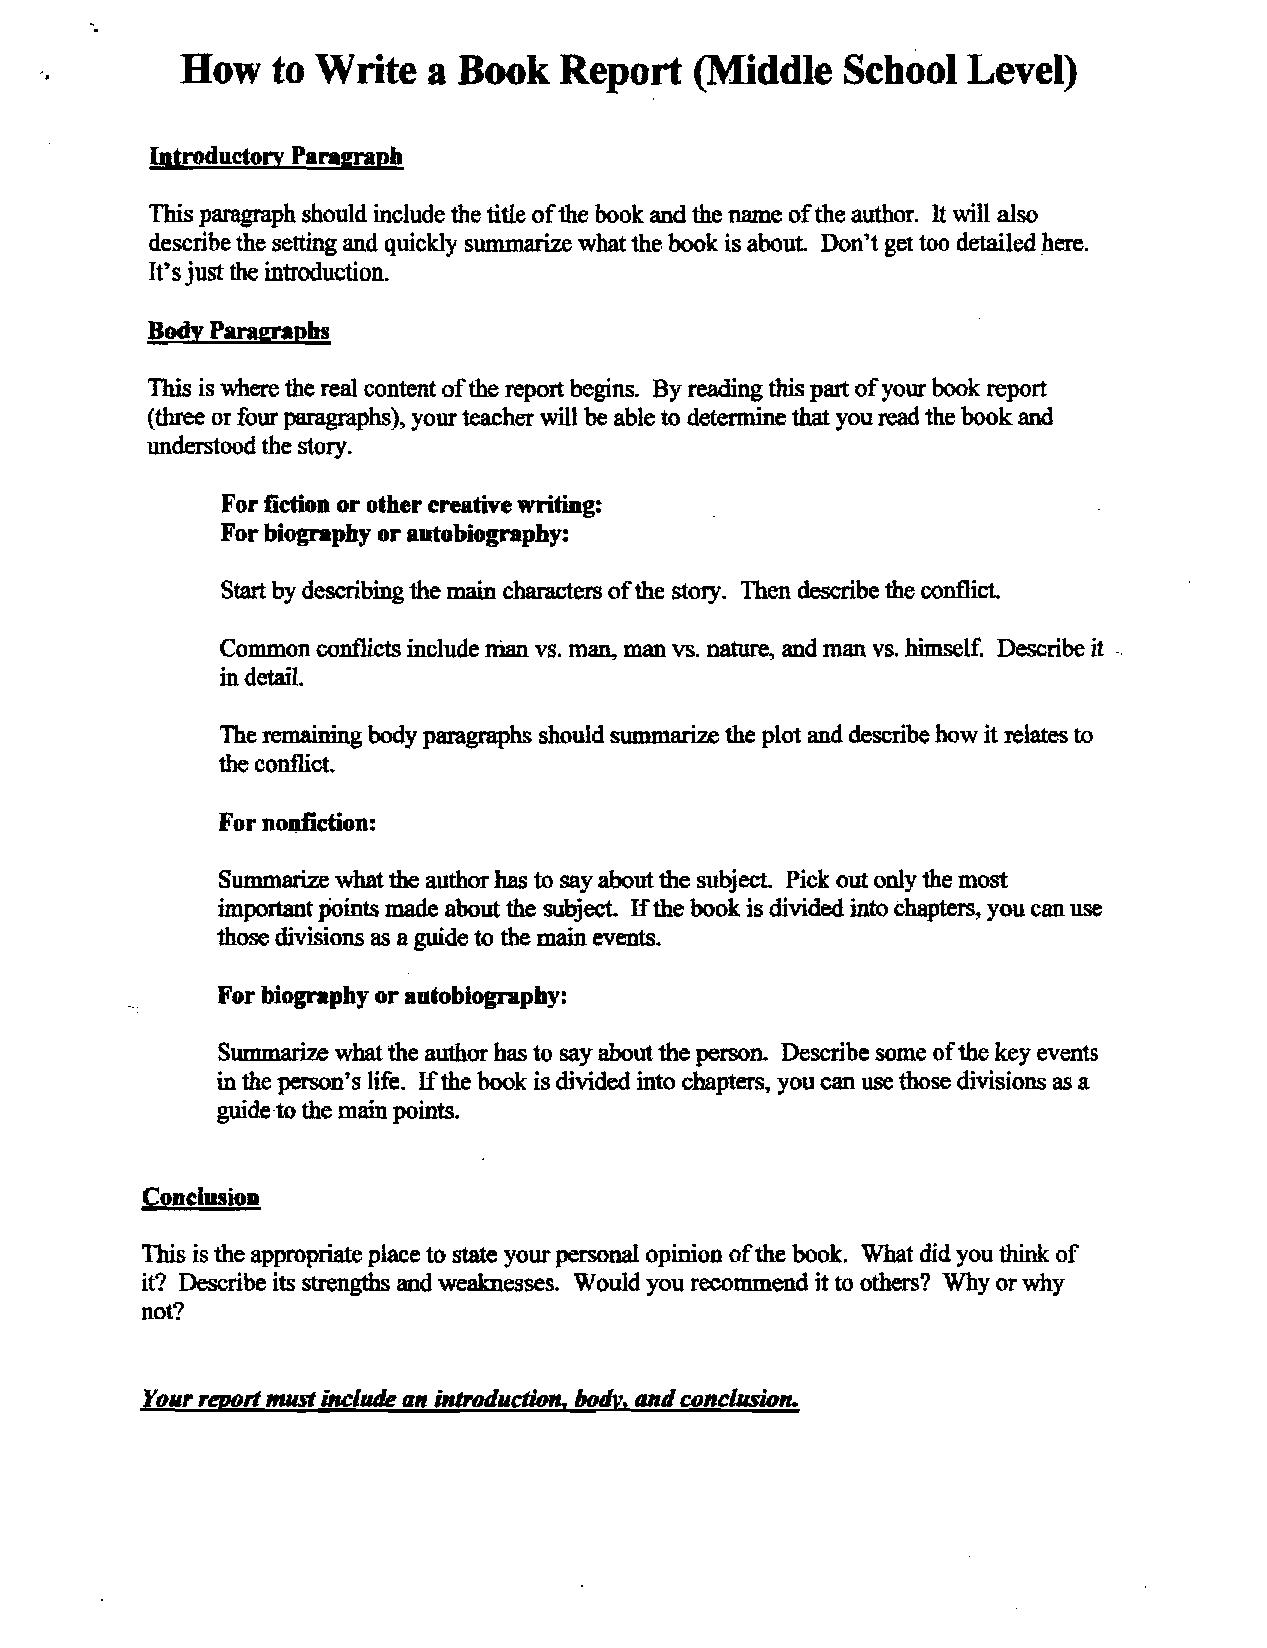 Middle School Book Report Flowchart  Middle School Book Report